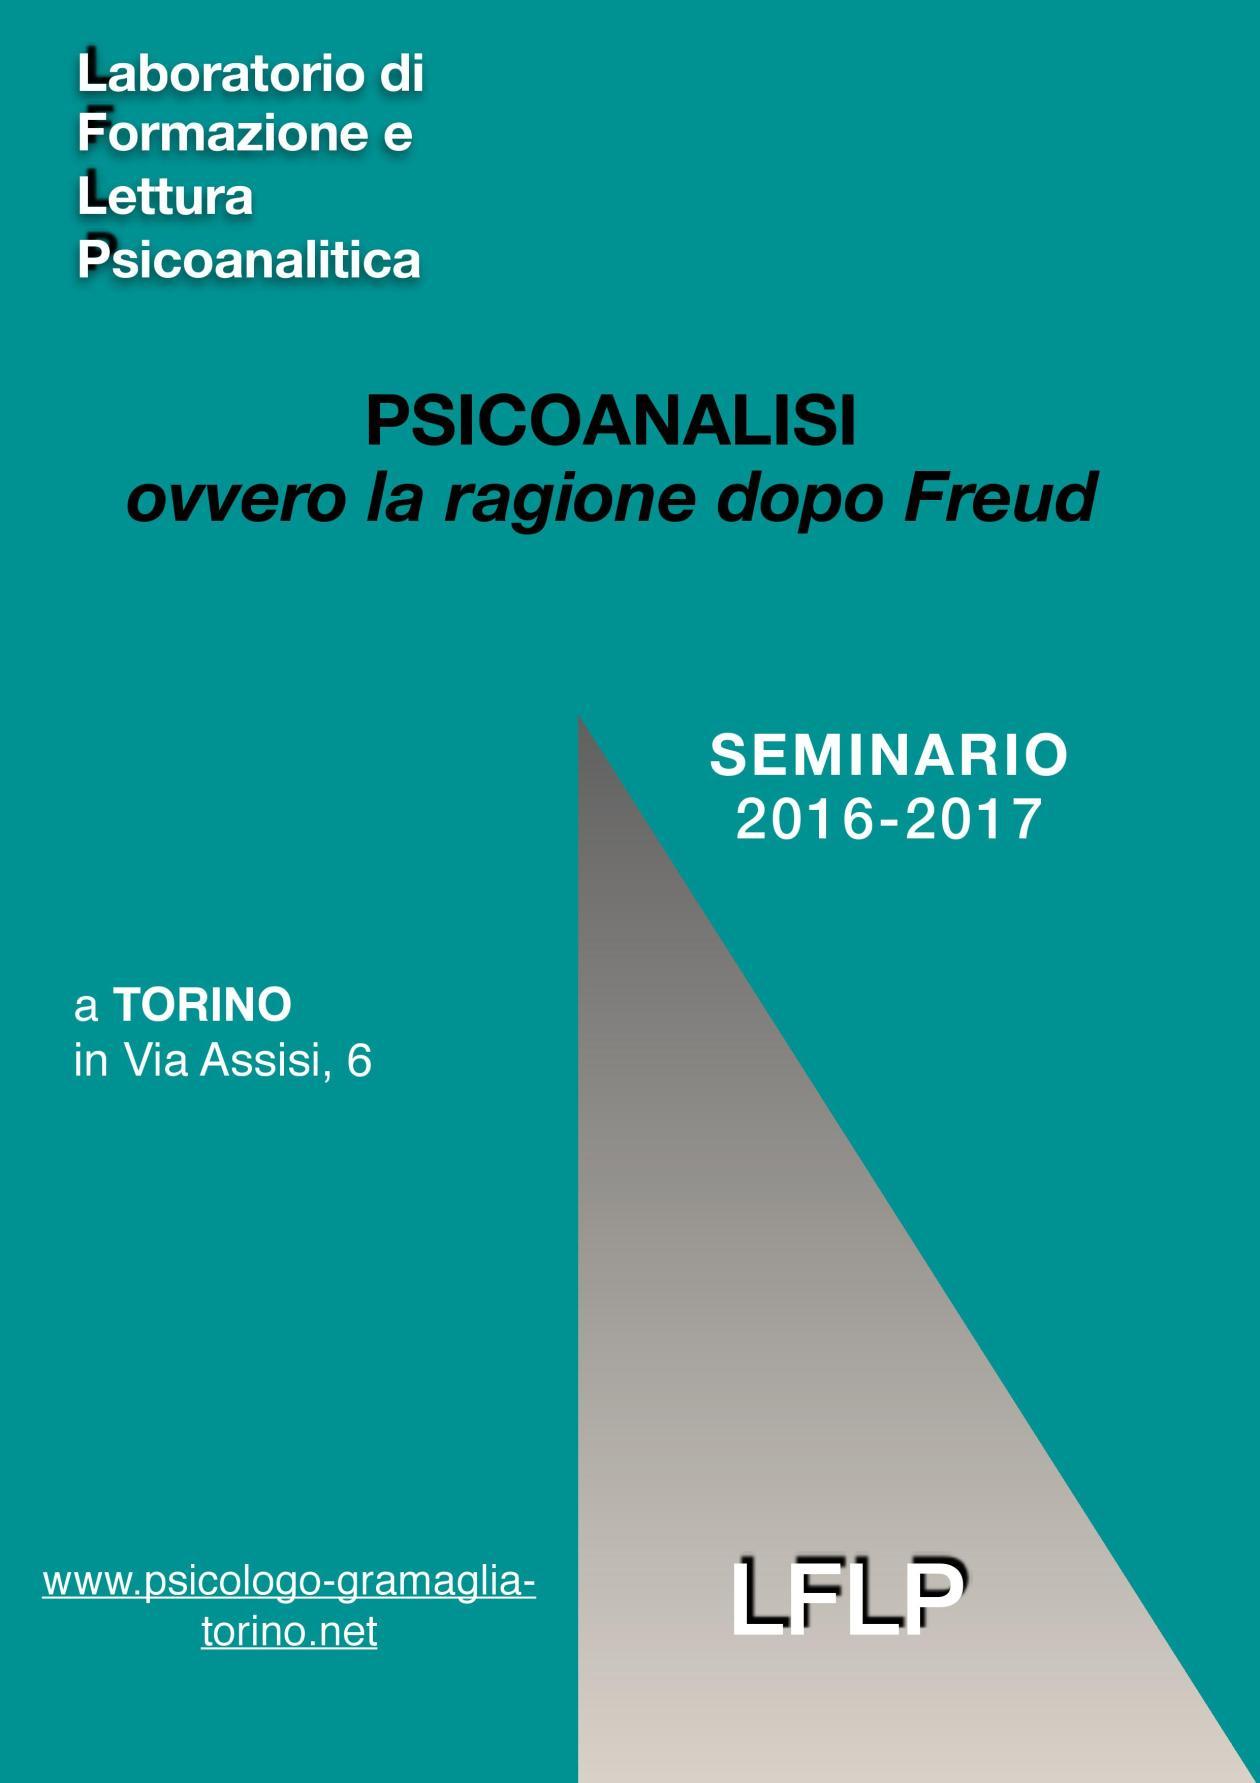 La ragione dopo Freud